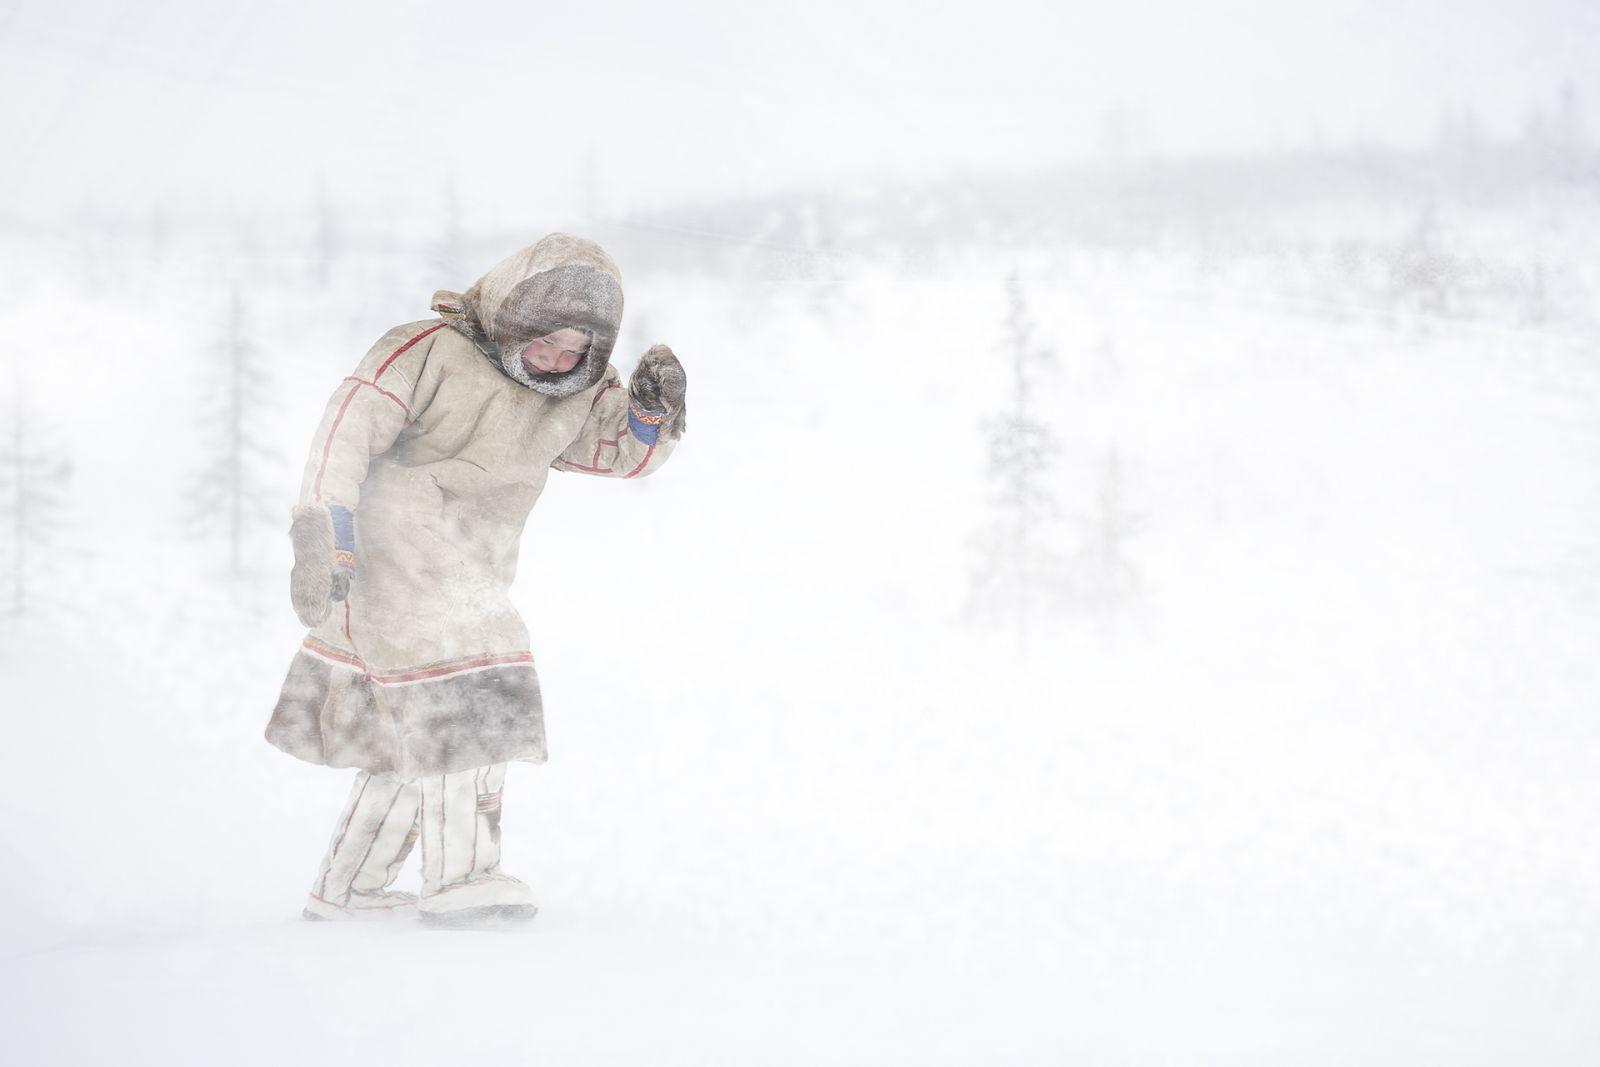 Пурга, © Владимир Алексеев, Финалист фотоконкурса «Самая красивая страна – 2018»